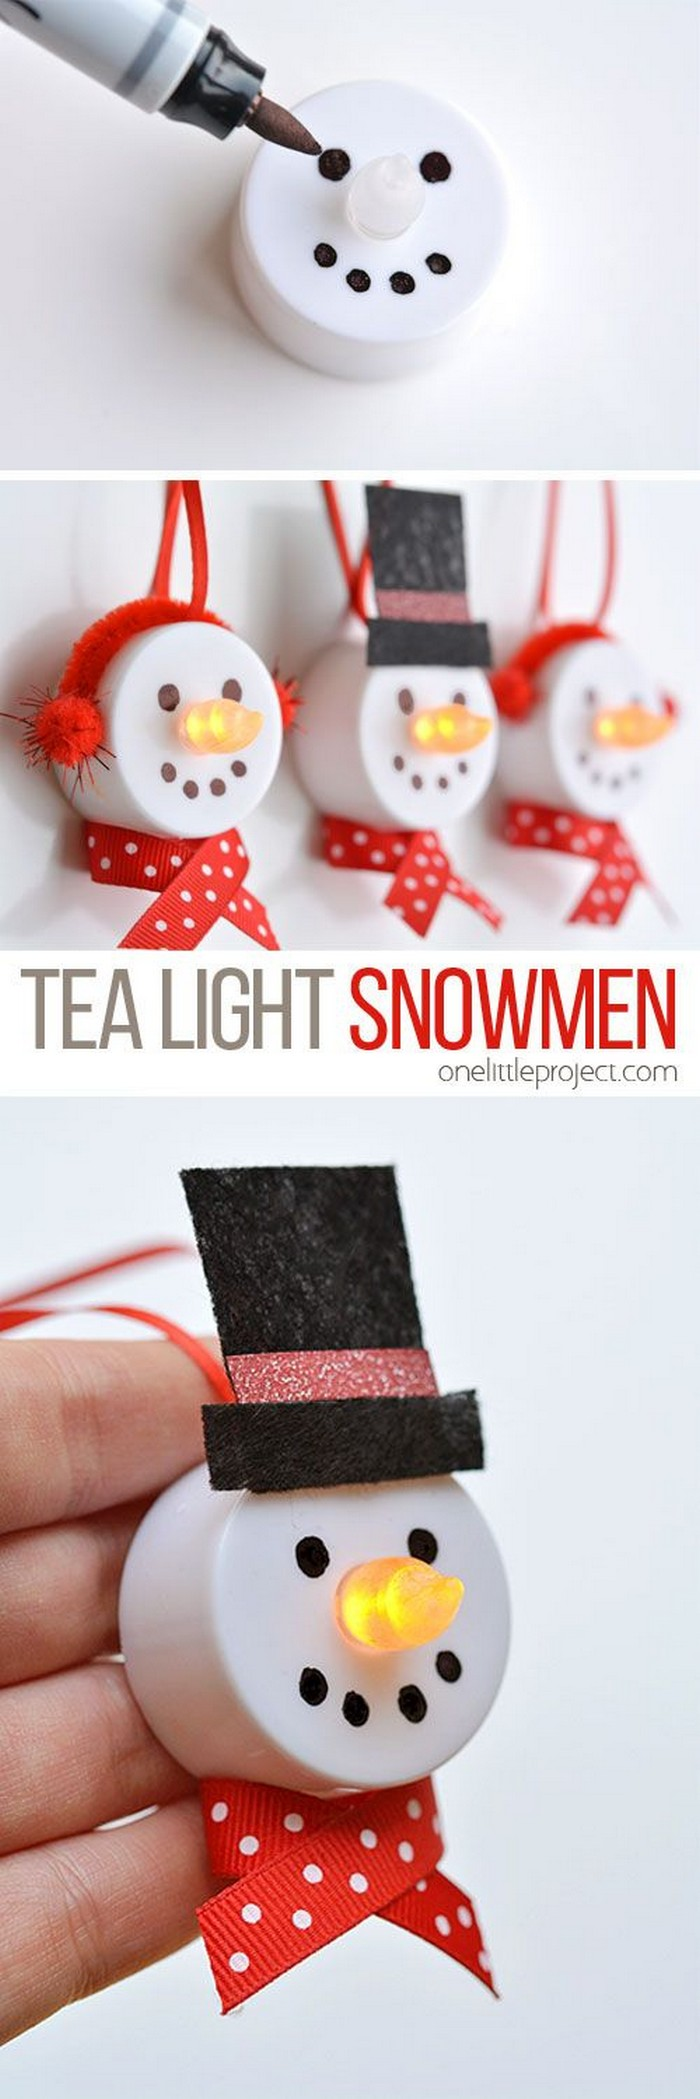 Tea Light Snowman Ornaments 25 Interesting Ideas to Make Easy Christmas Crafts